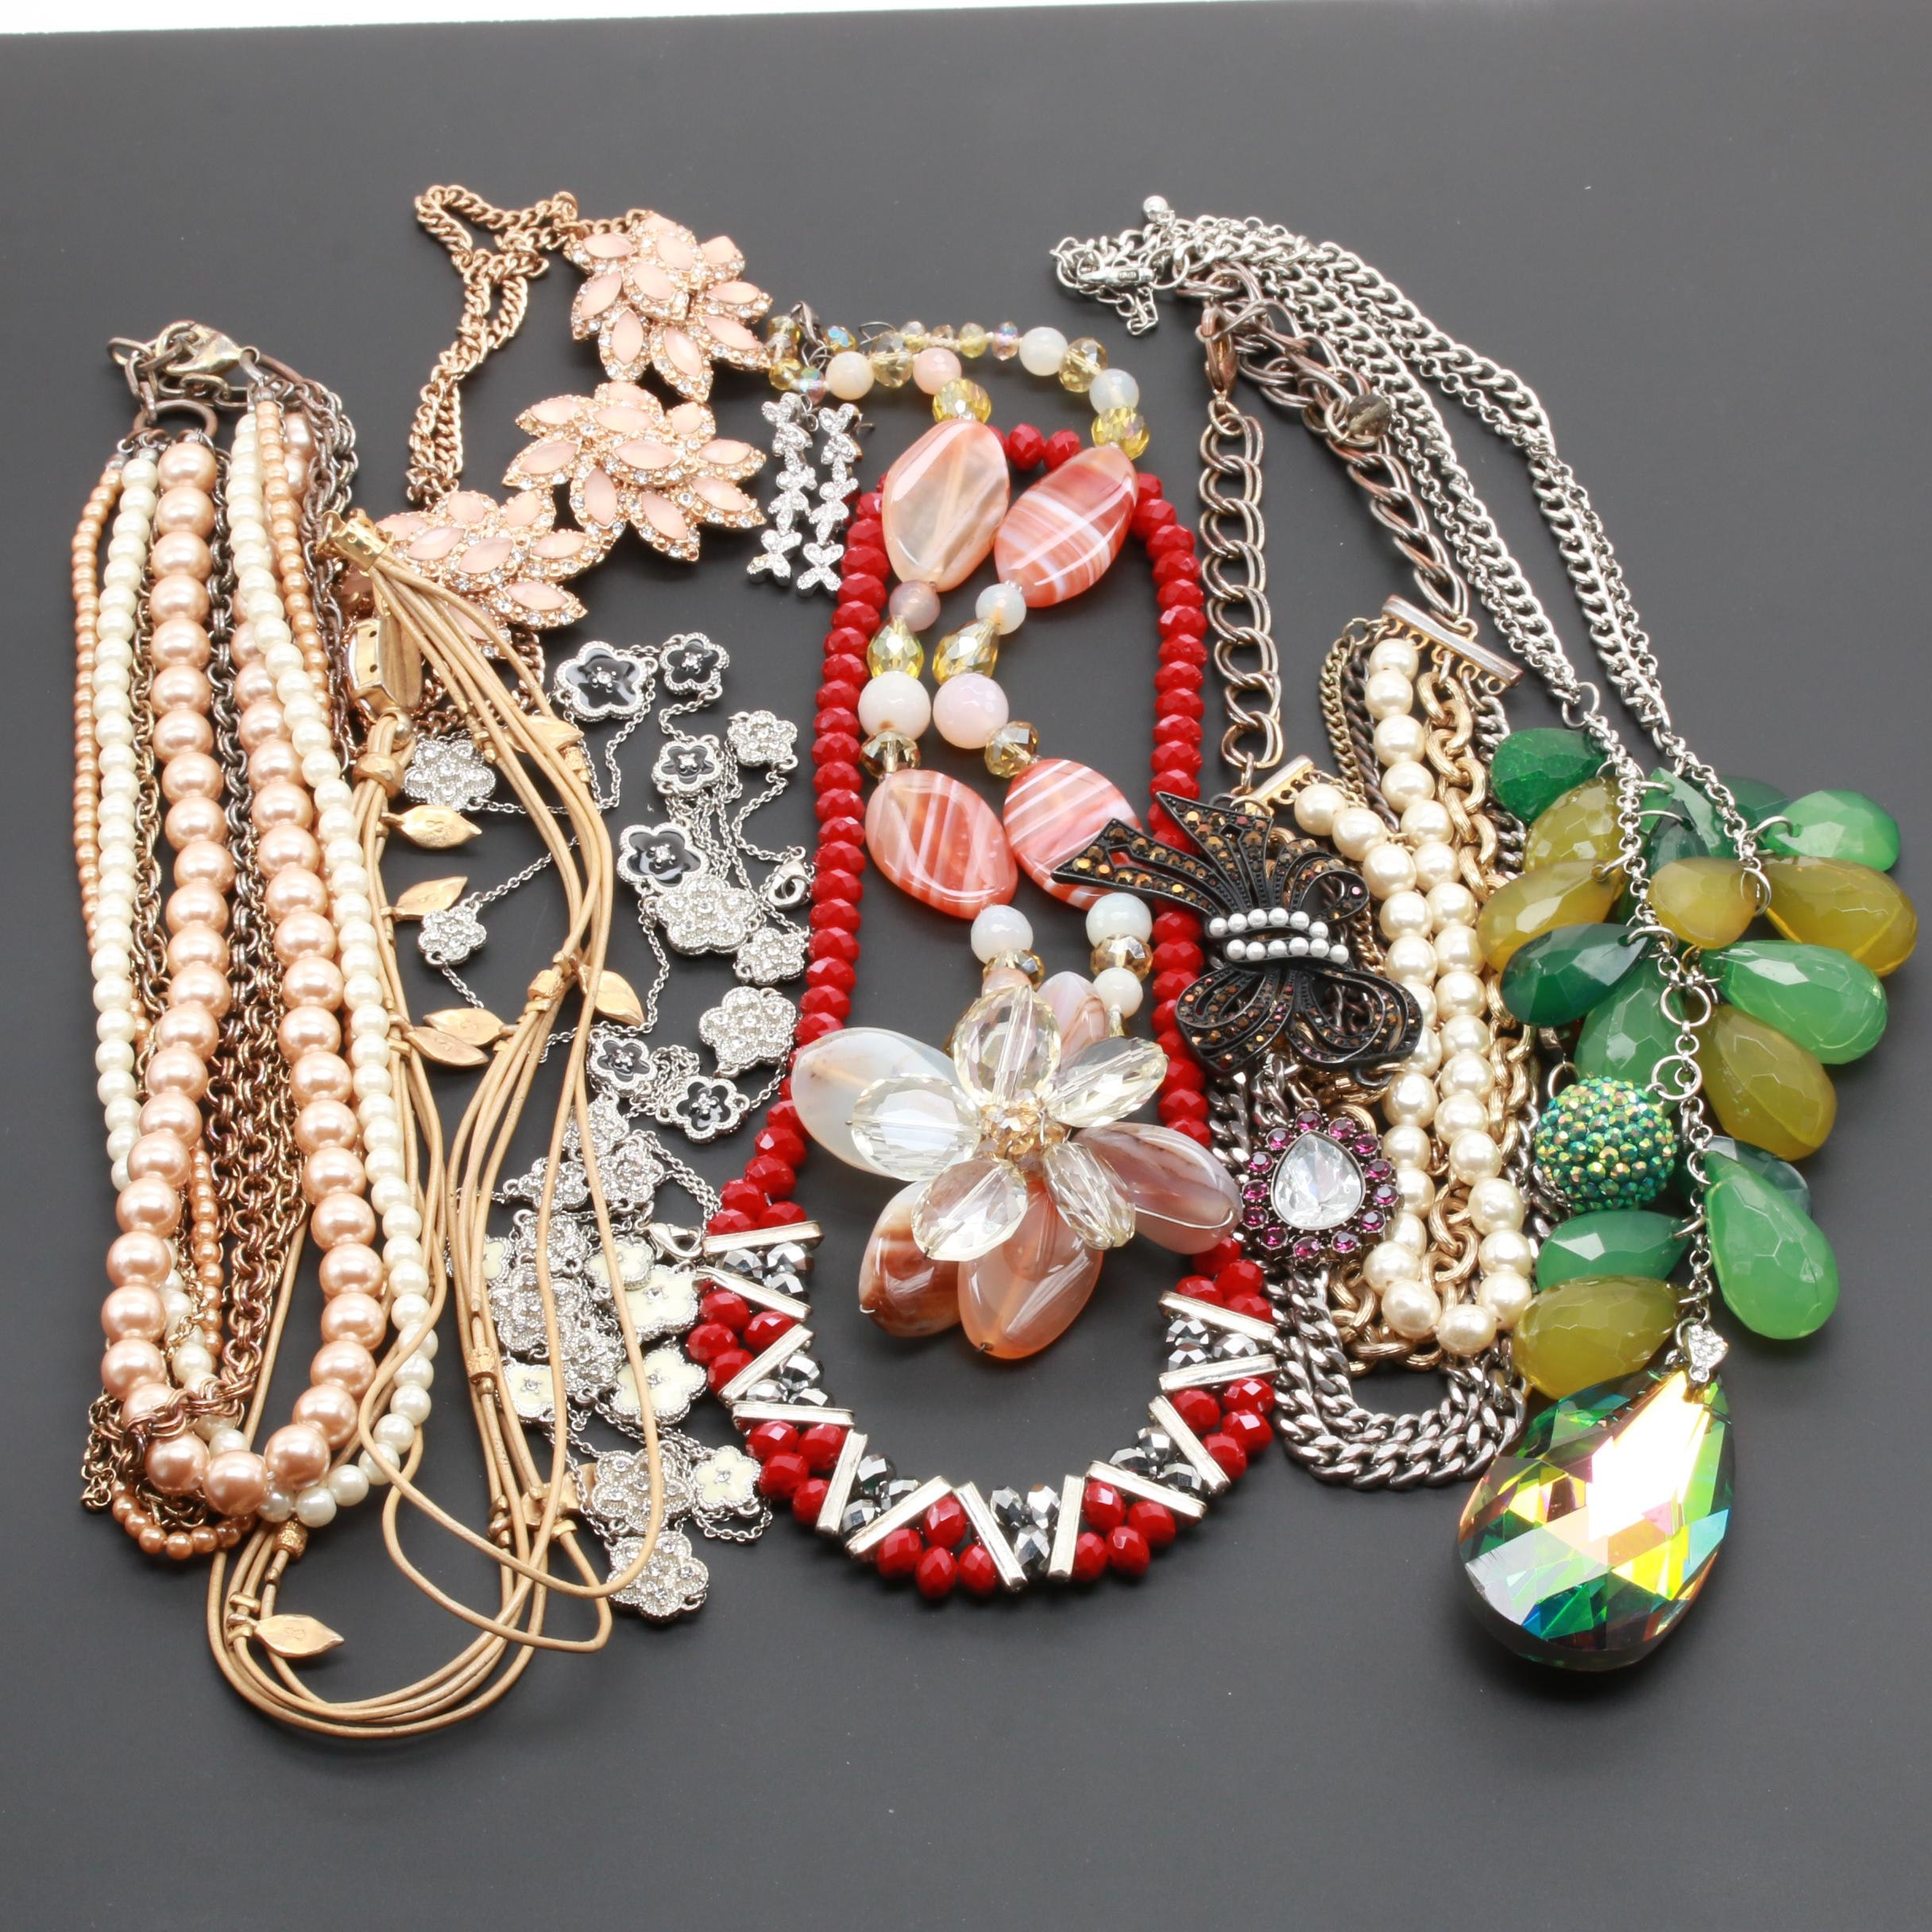 Assortment of Costume Gemstone Jewelry With Imitation Pearl